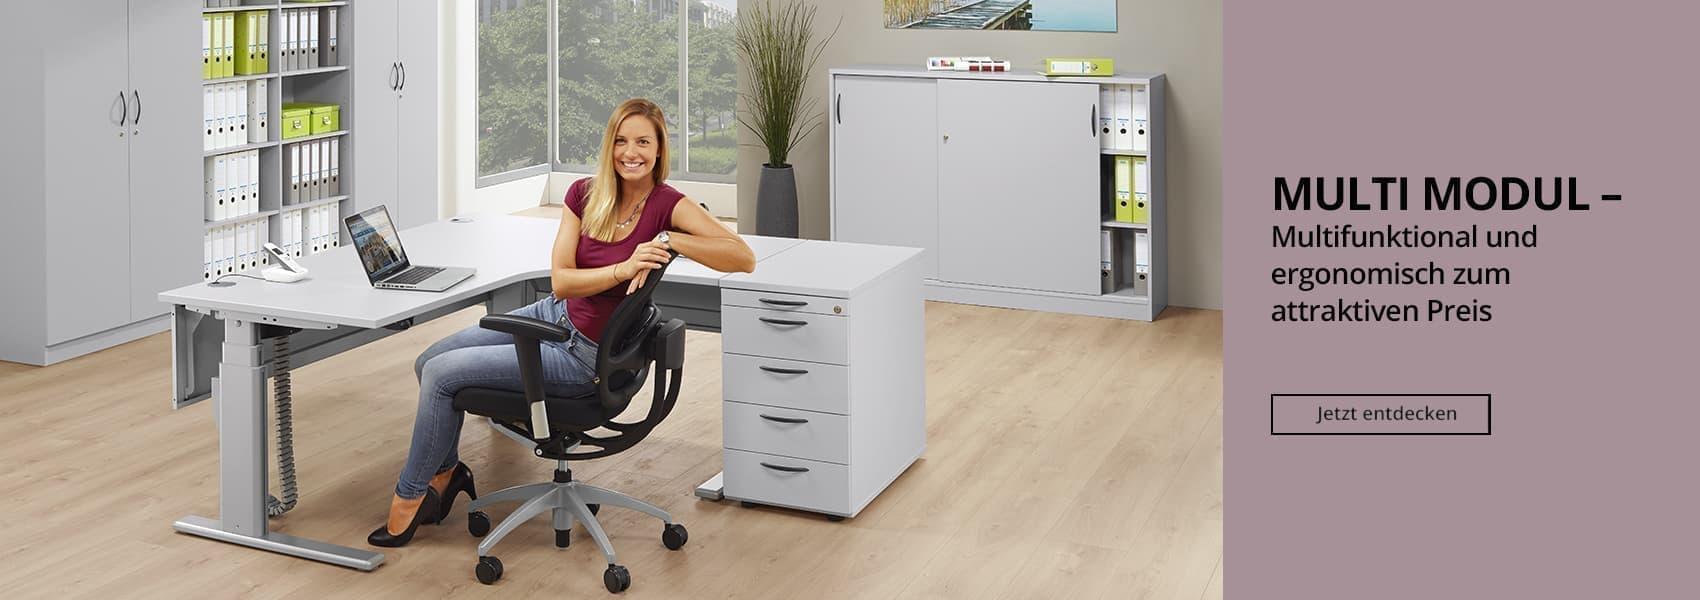 Büromöbelsystem MULTI MODUL